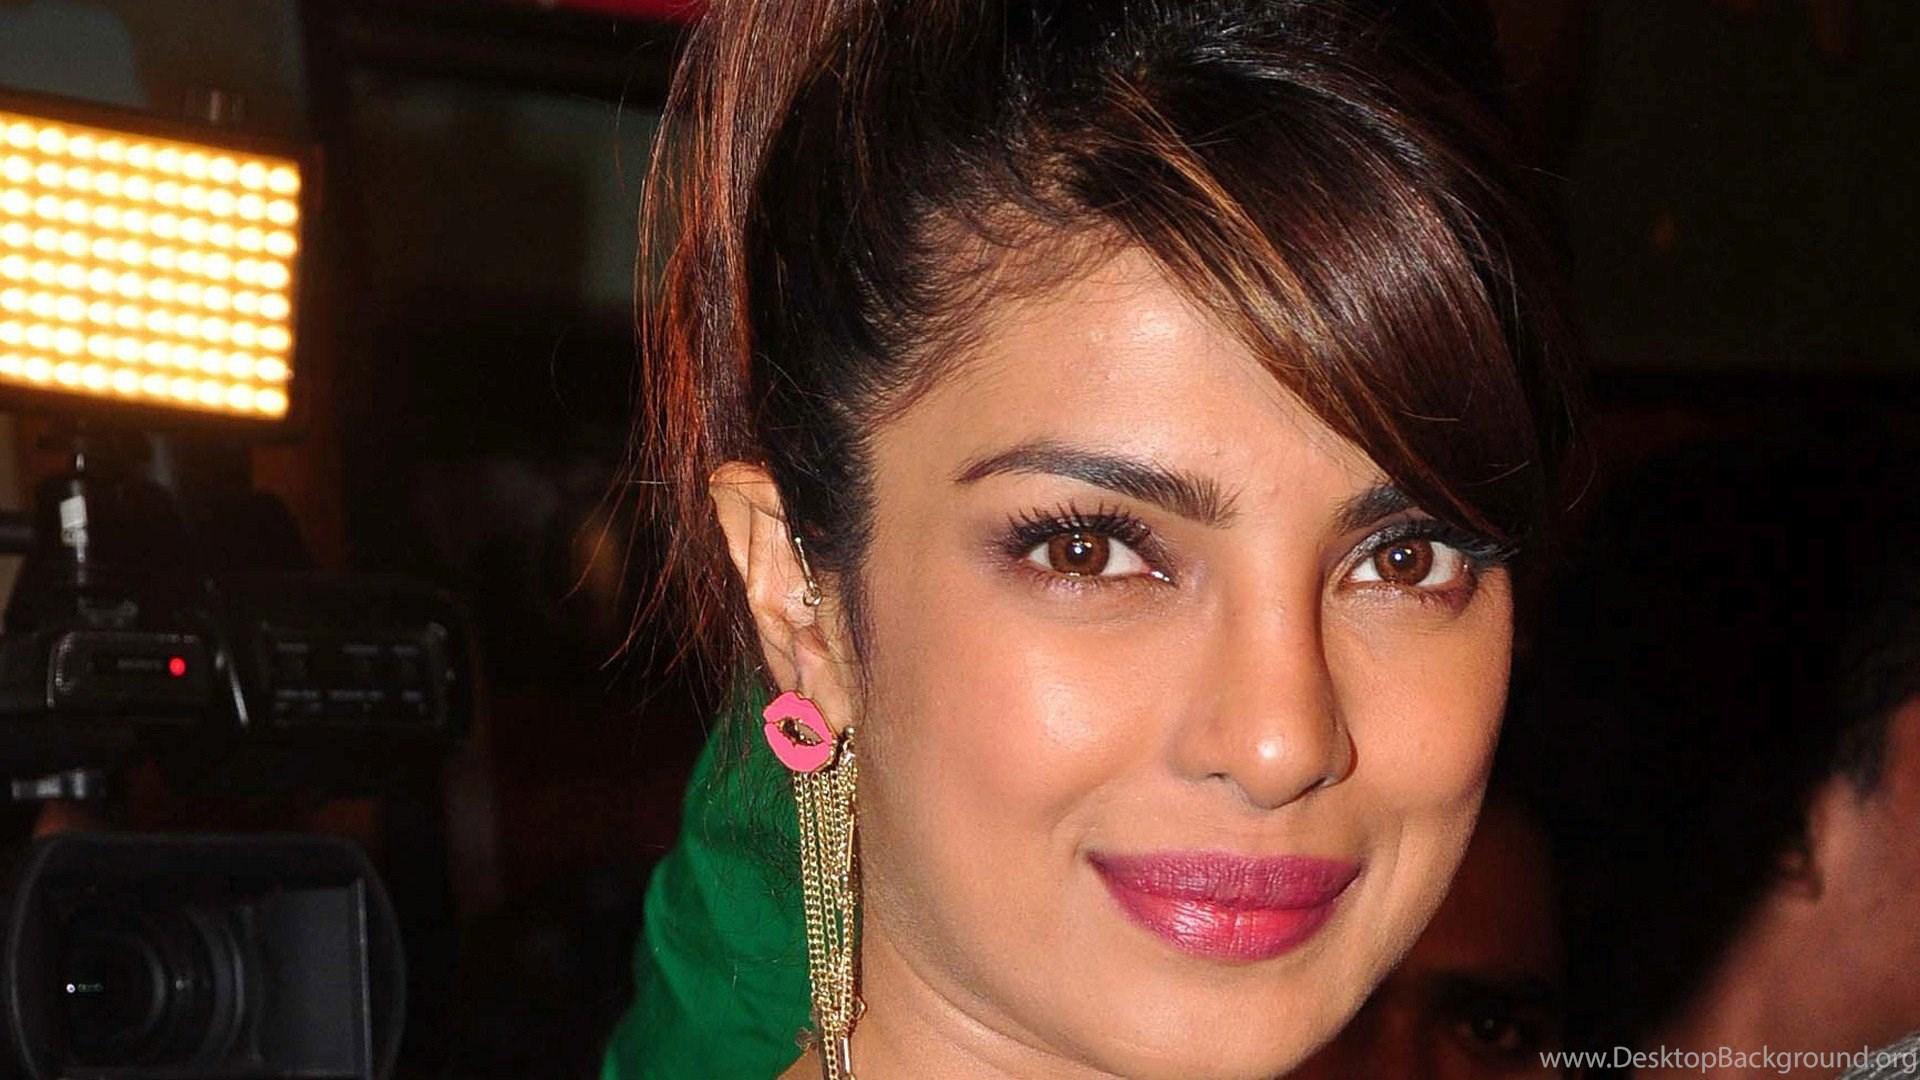 priyanka chopra hot saree hd wallpapers hot desktop background